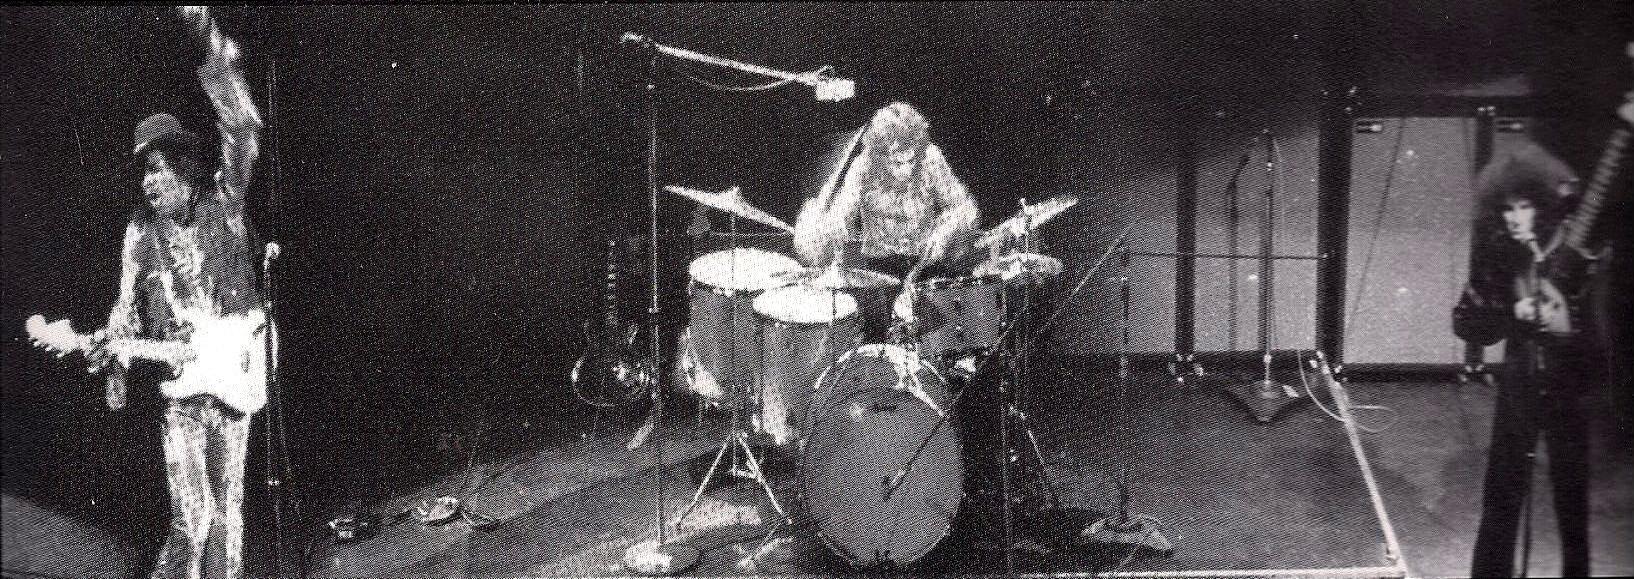 New York (Fillmore East) : 10 mai 1968 [Second concert] 493250scanjpg80099